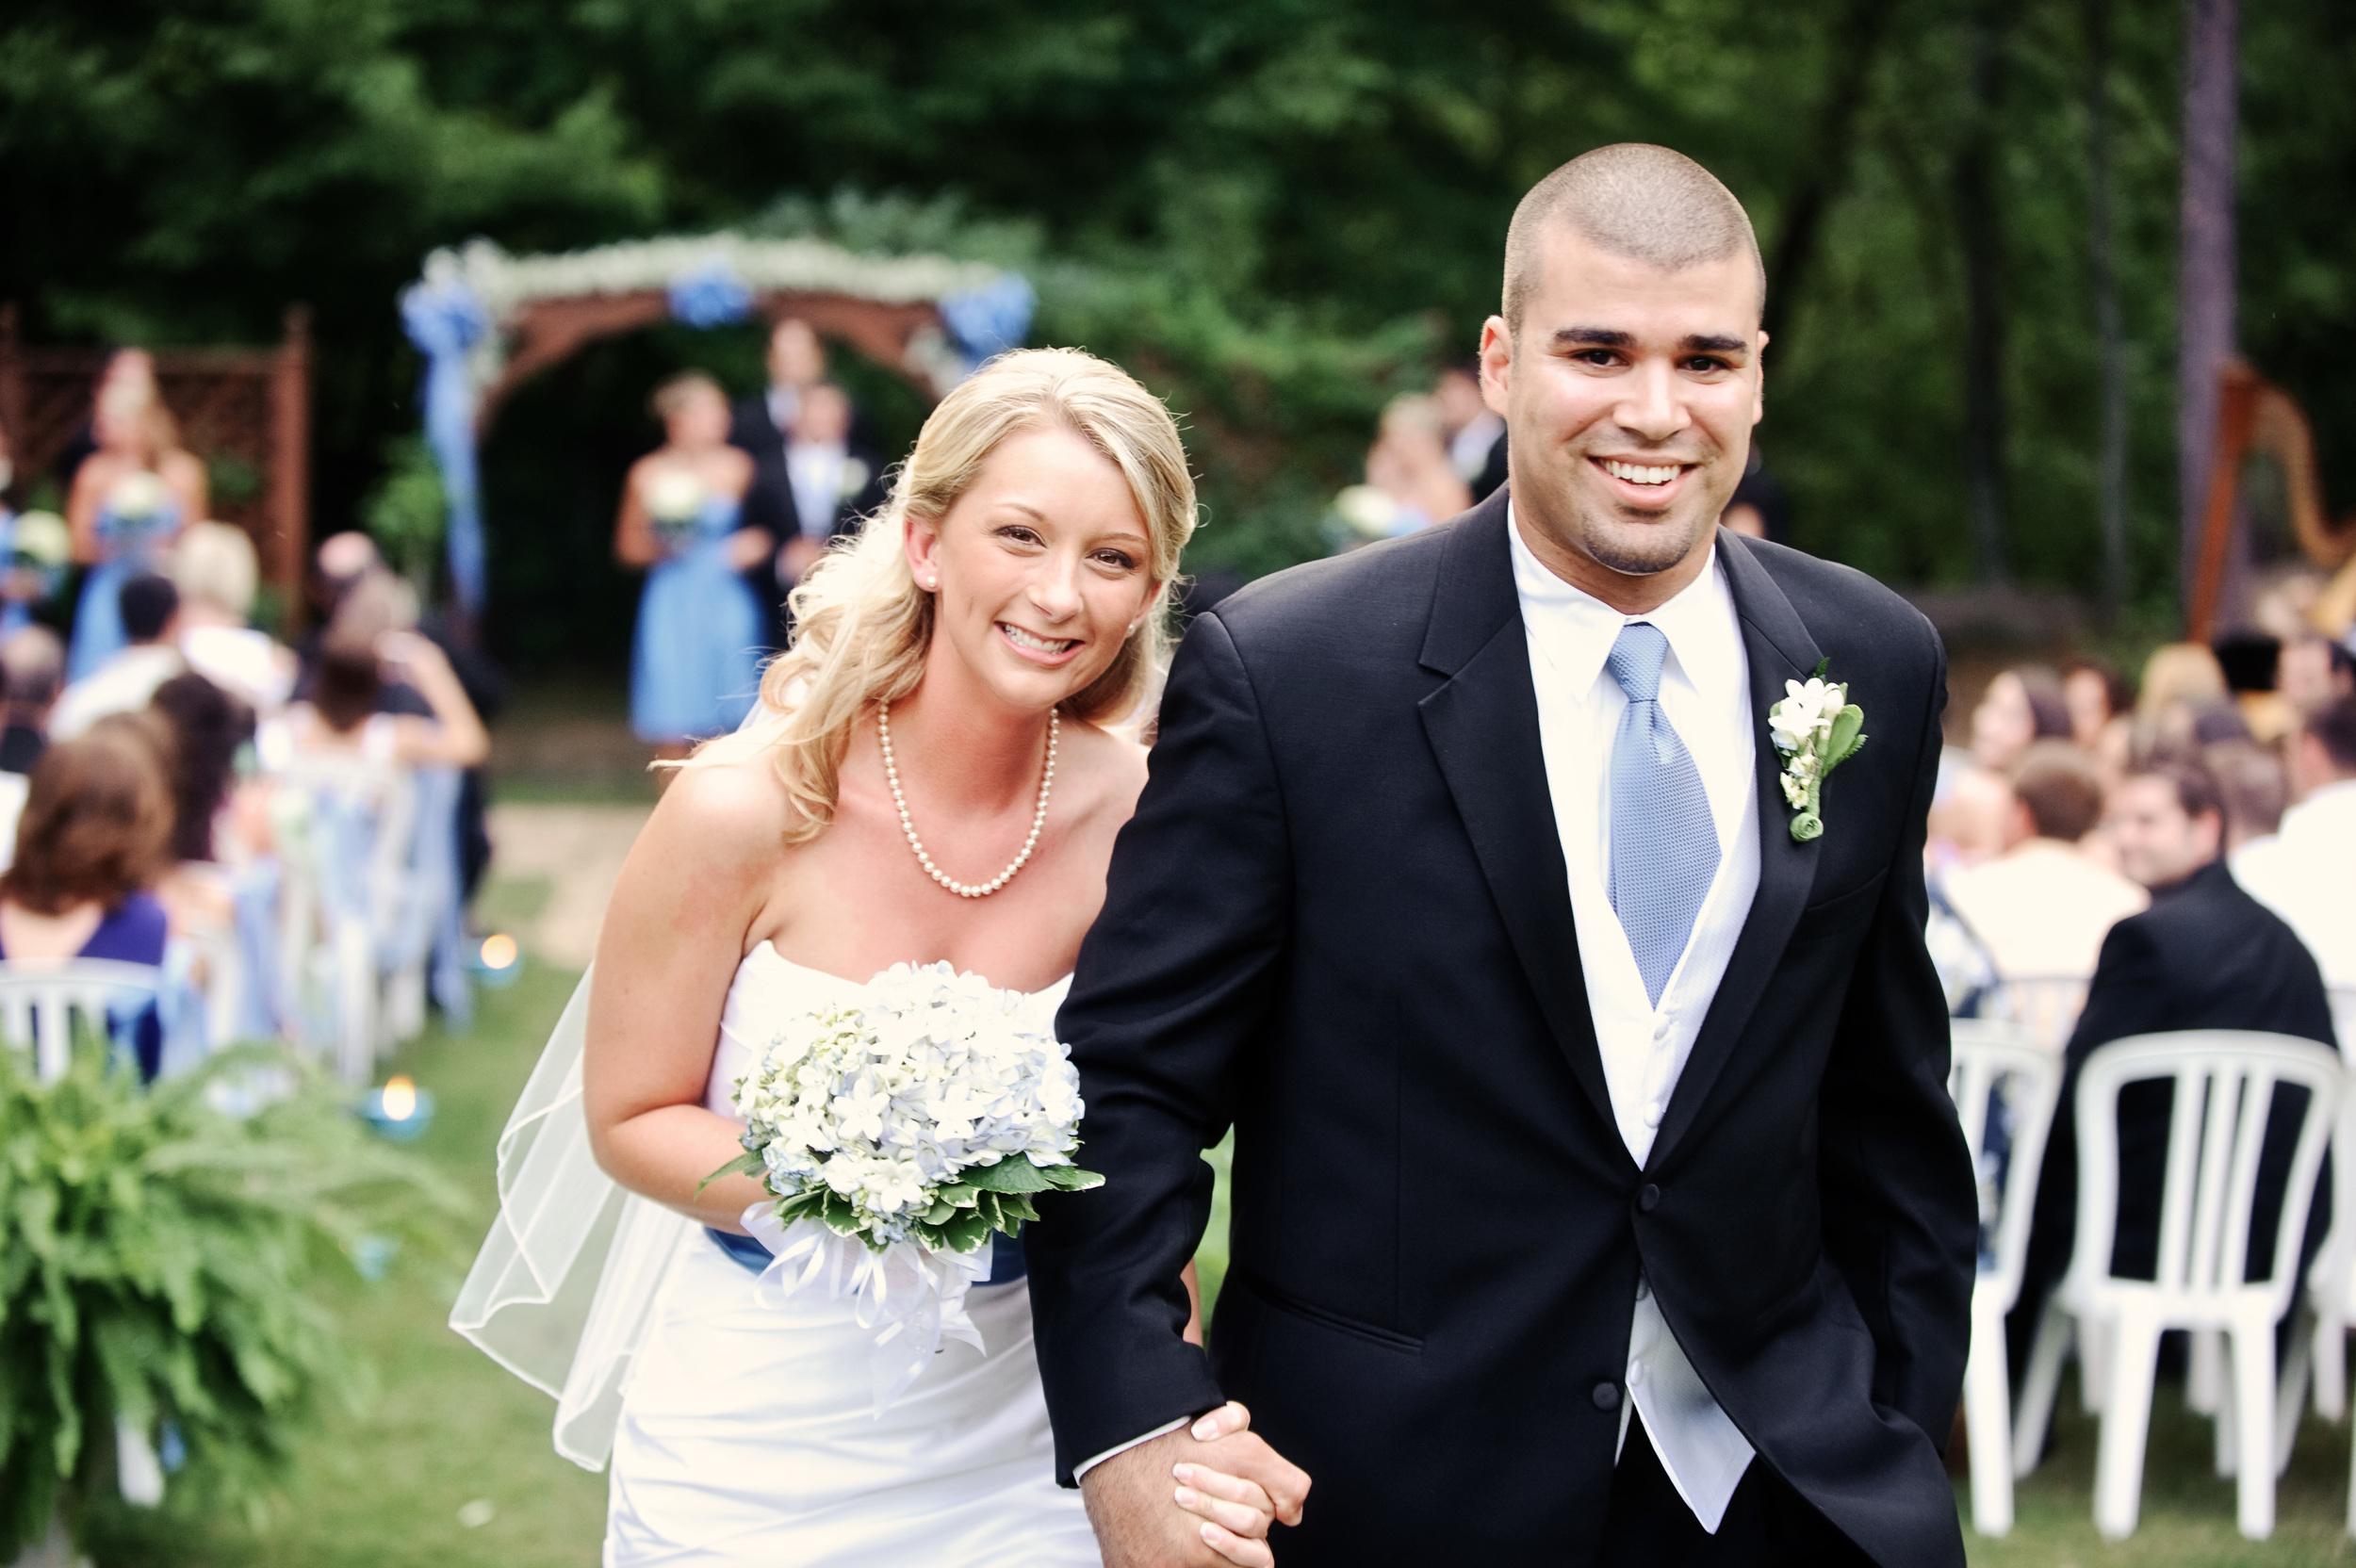 atlanta-wedding-officiant